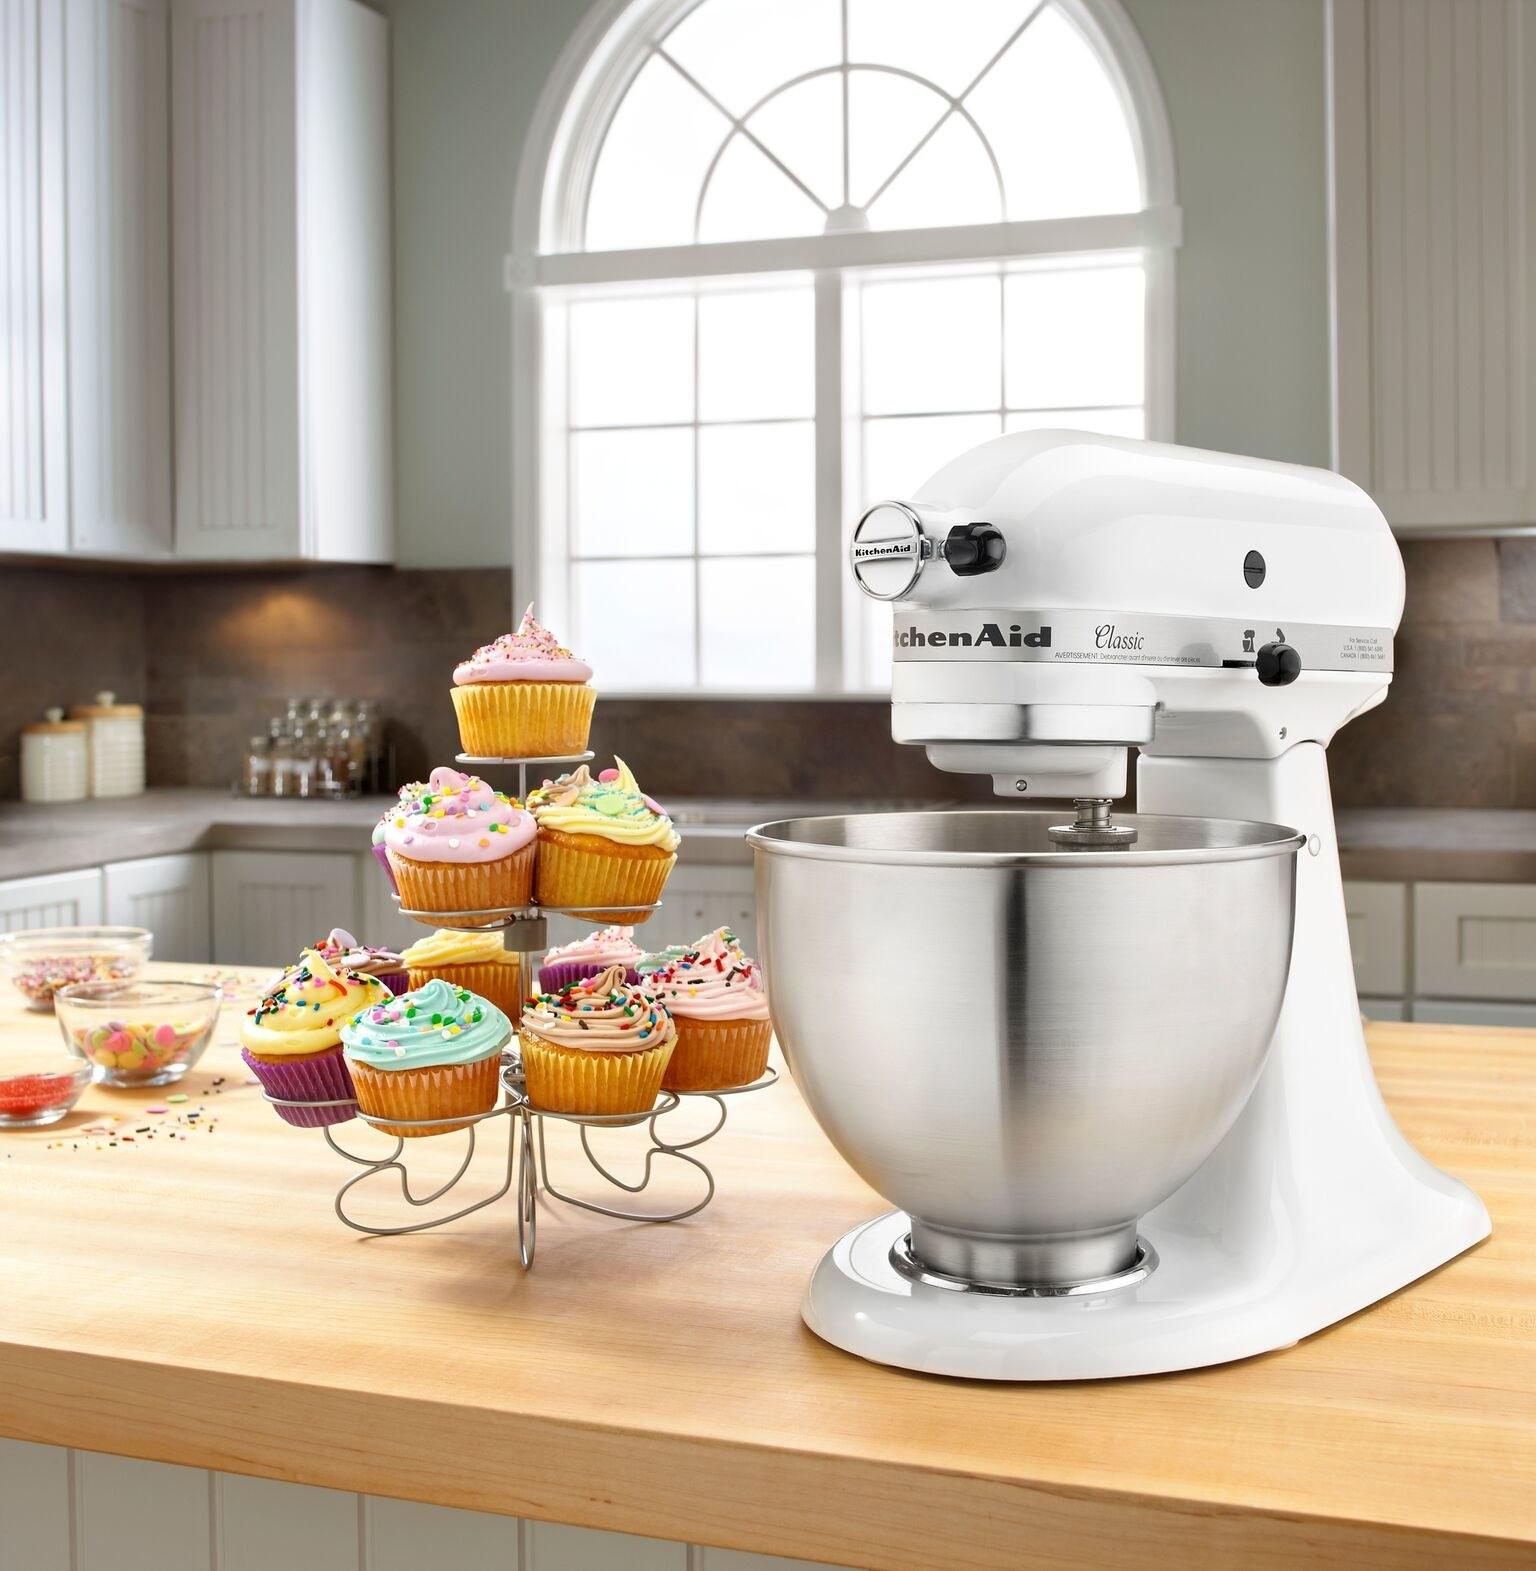 A white KitchenAid mixer